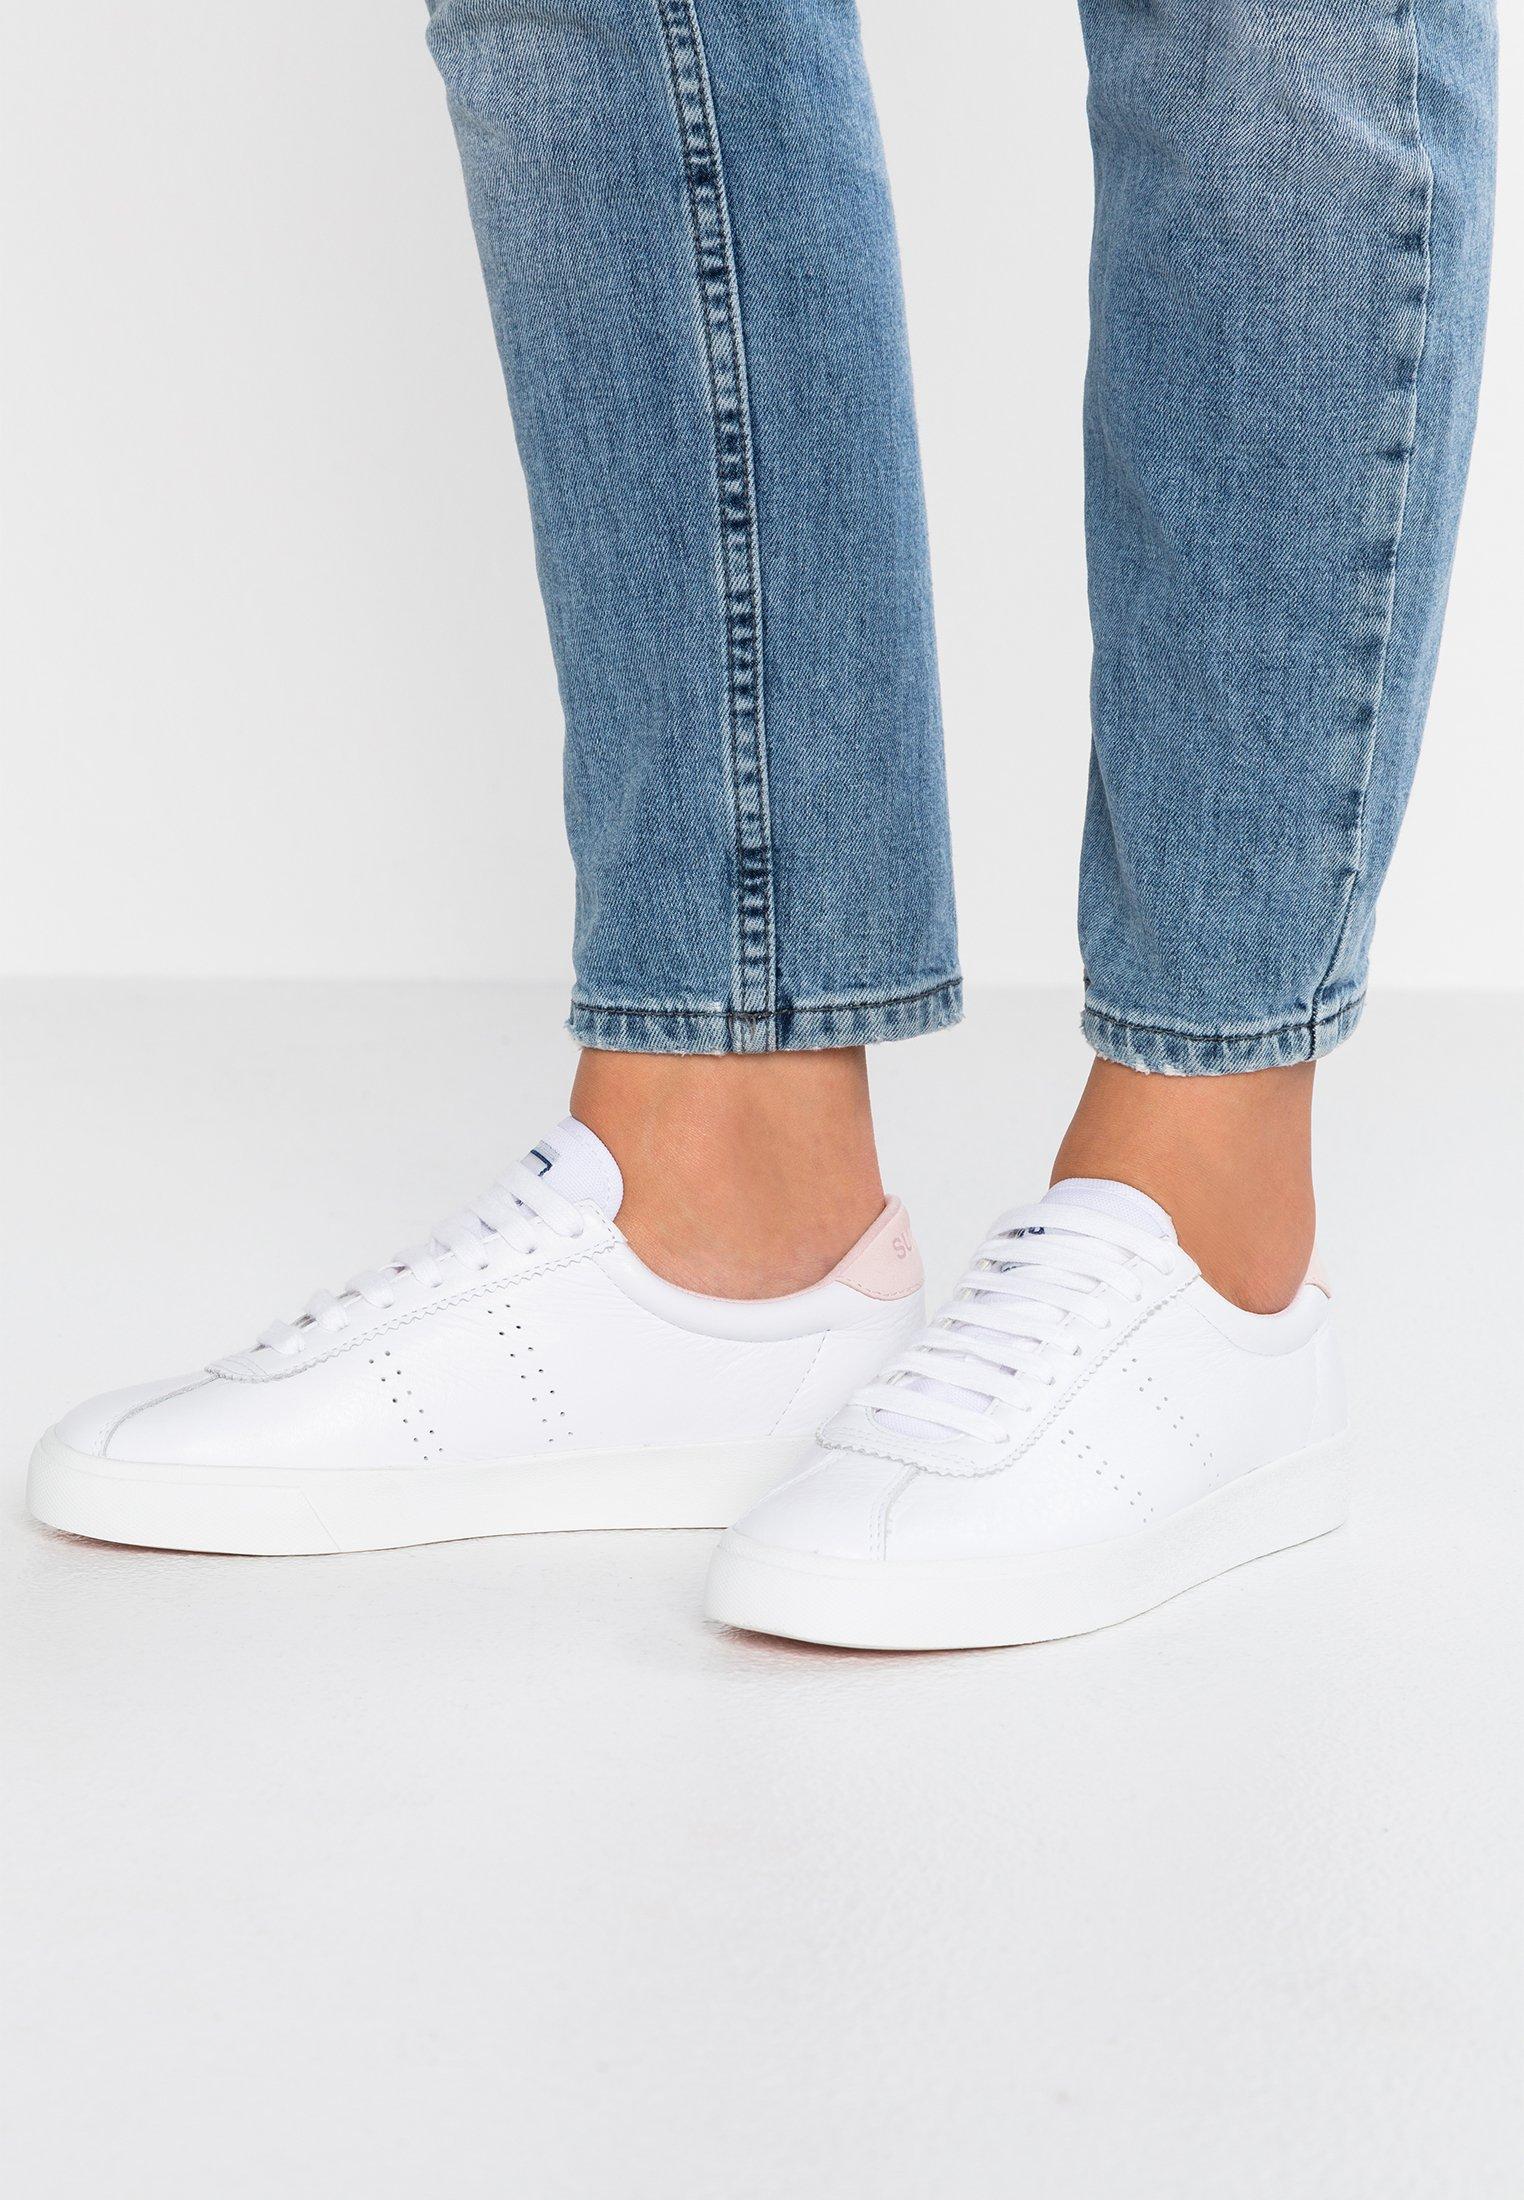 Superga 2843 - Sneakers - white/pink